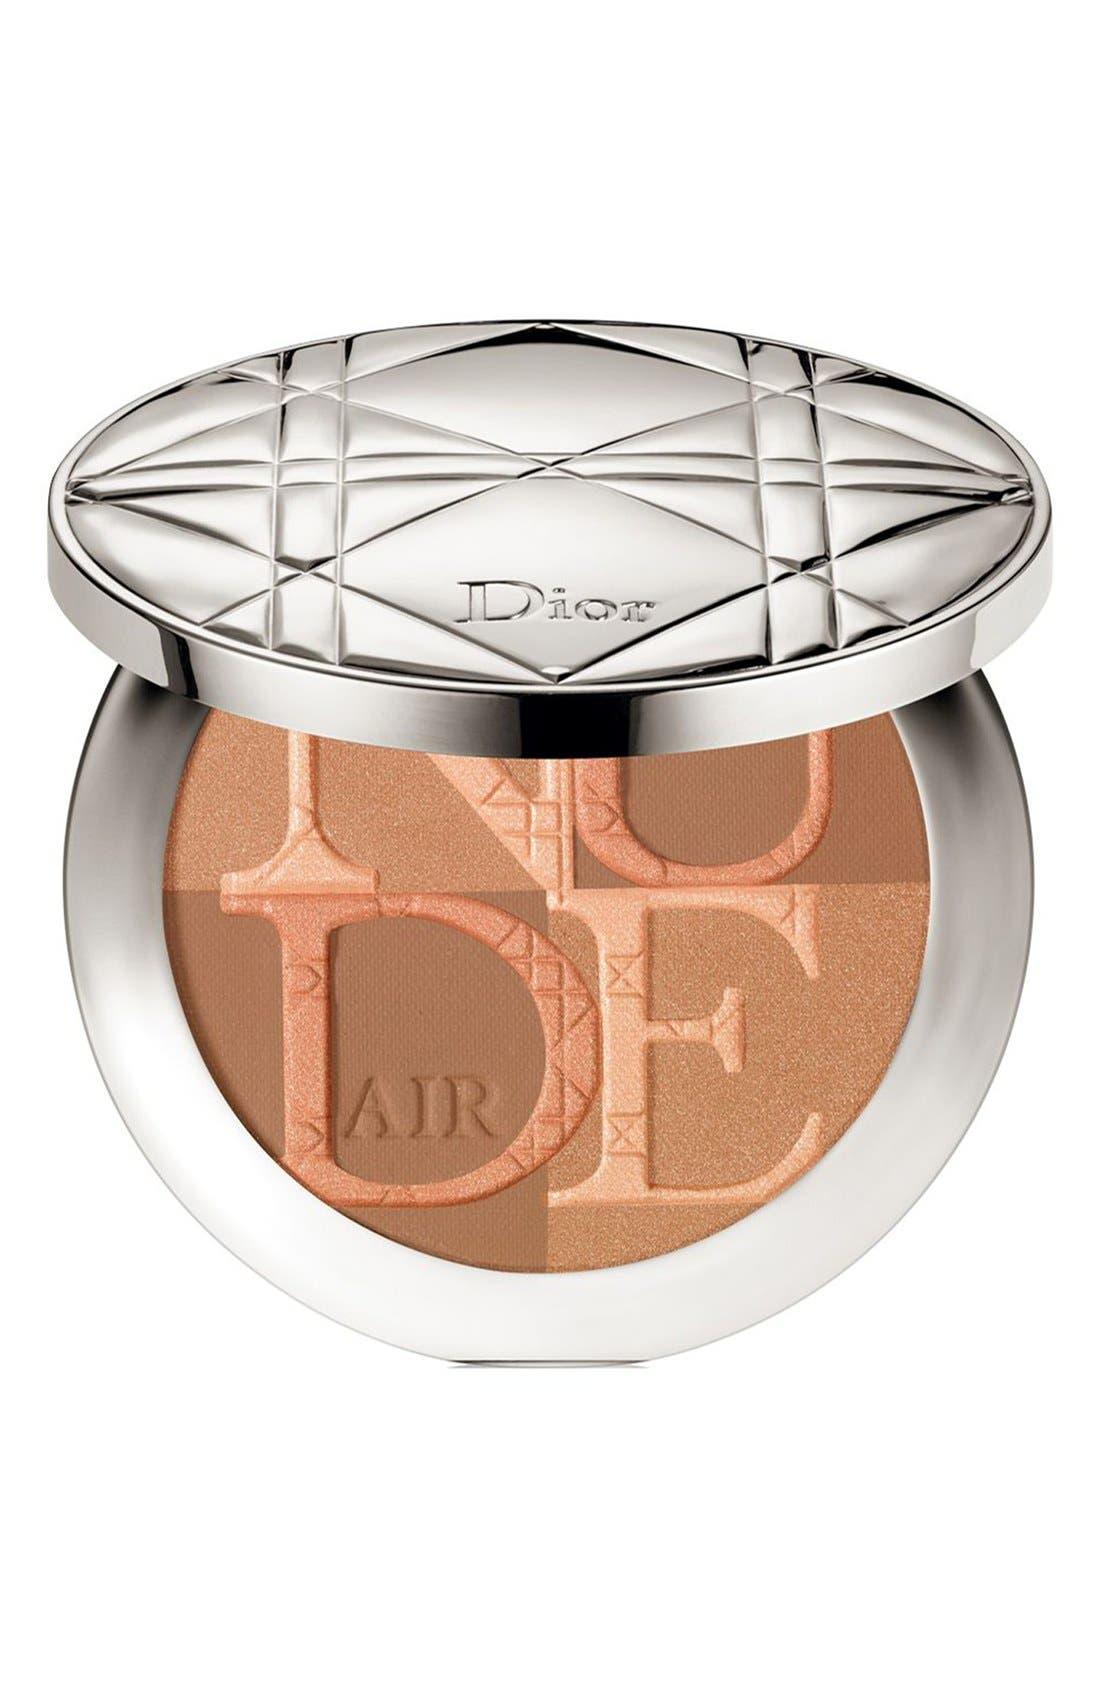 Dior 'Diorskin' Nude Air Glow Powder